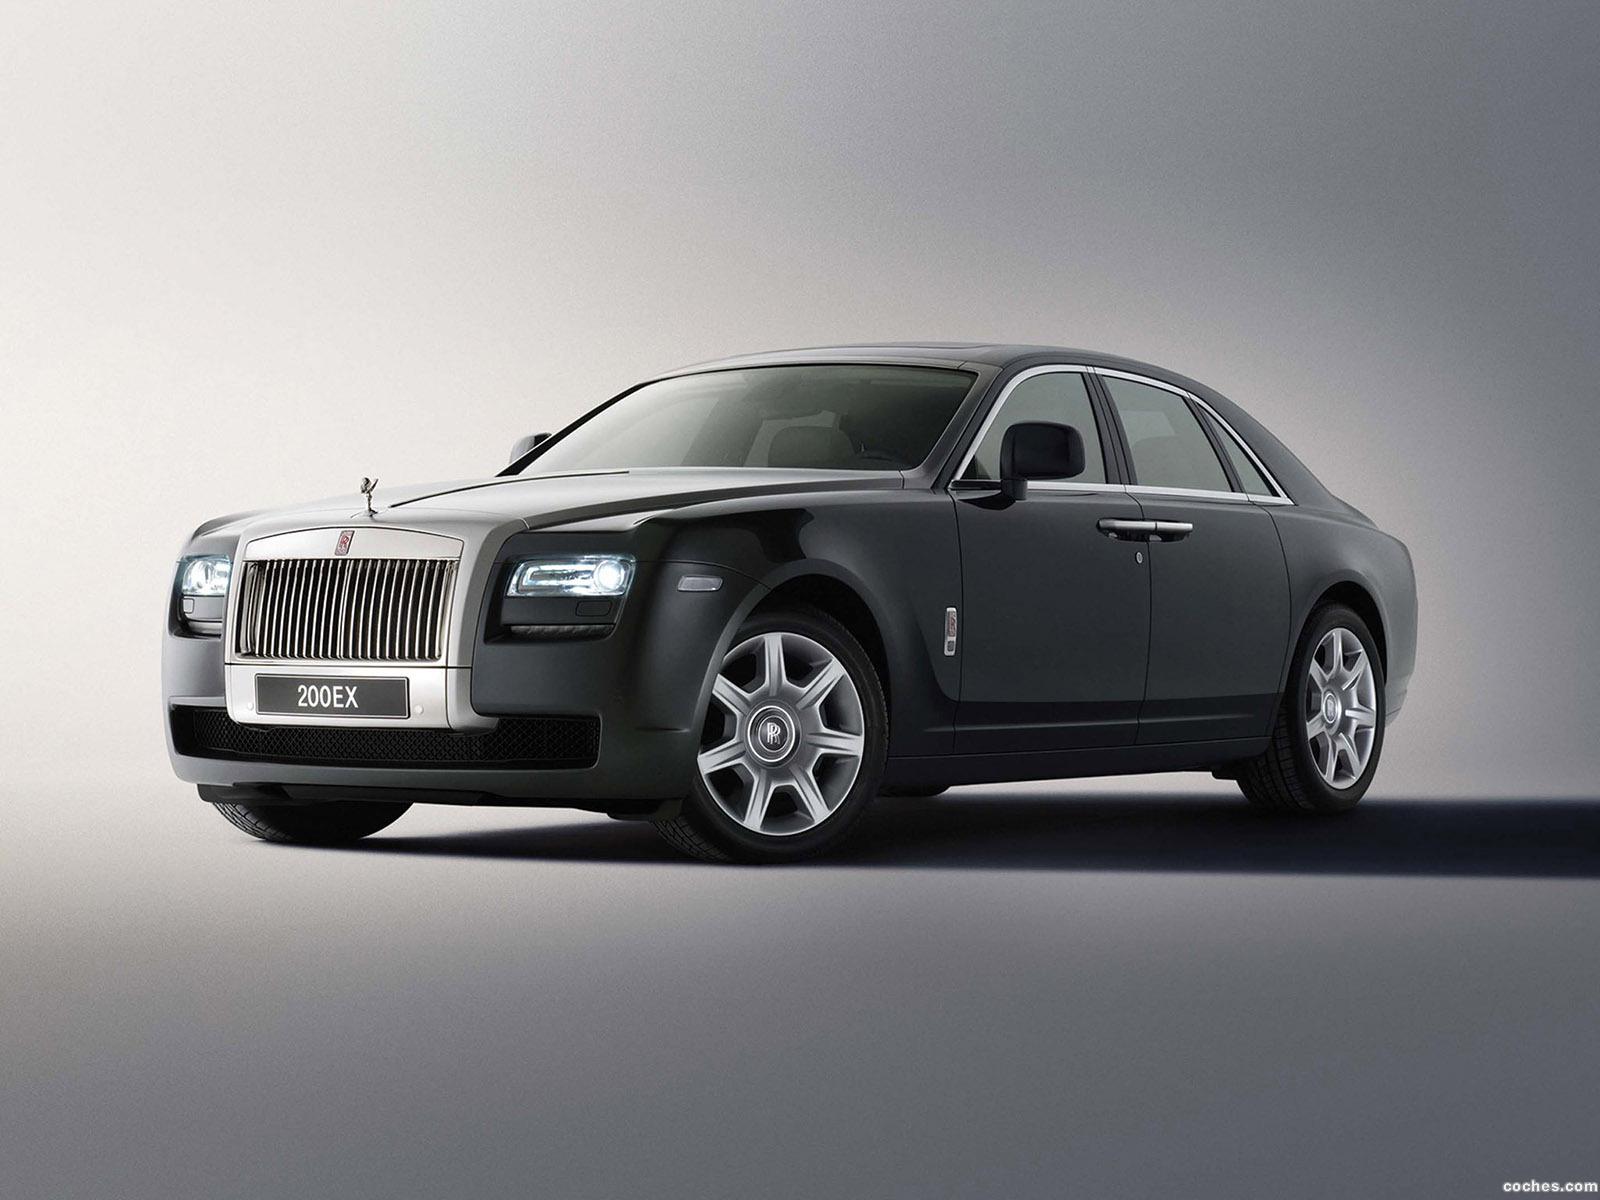 Foto 0 de Rolls Royce 200 EX Concept 2009